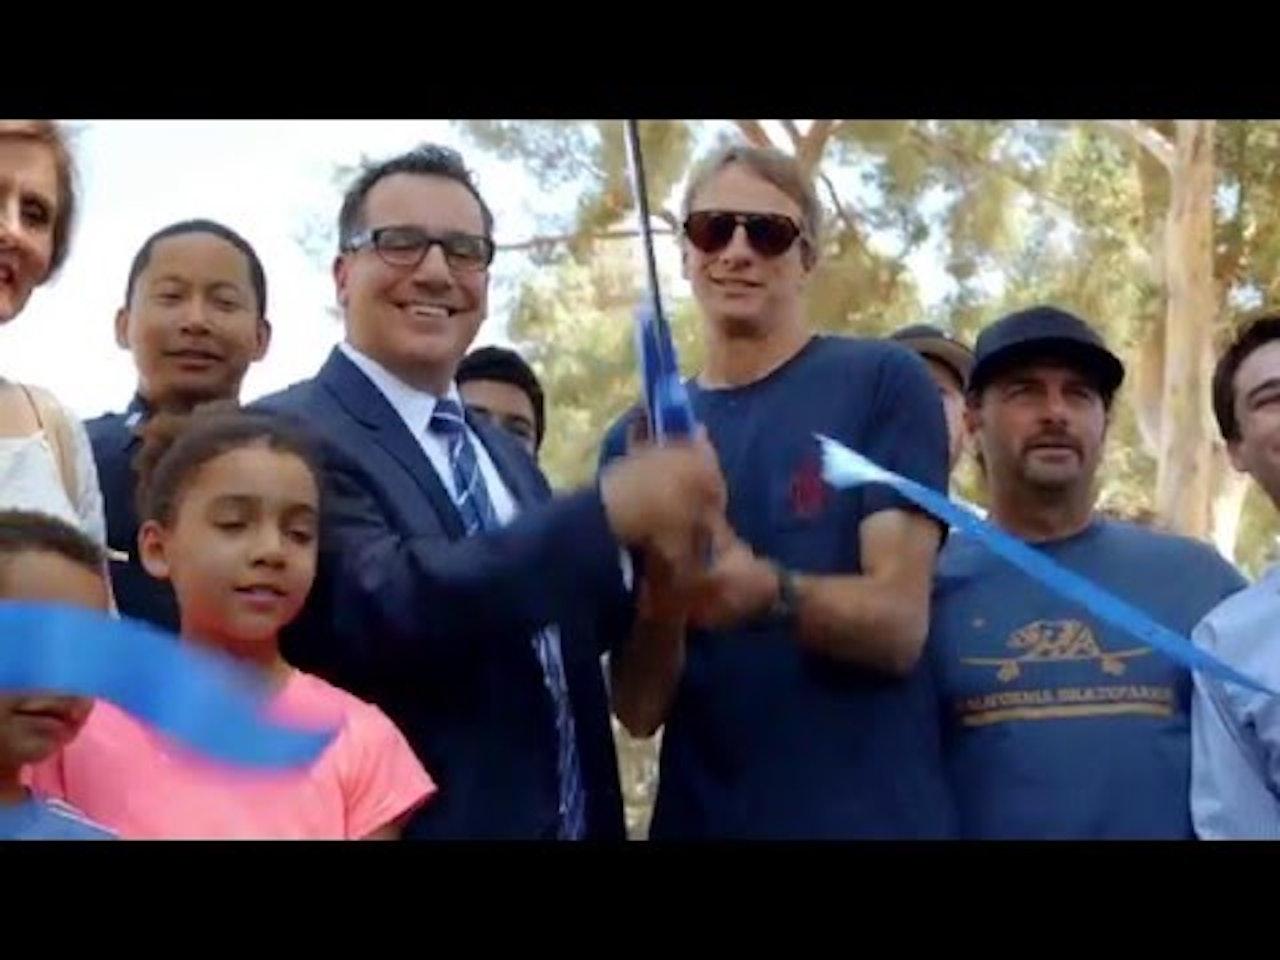 Tony Hawk Foundation - Building Communities